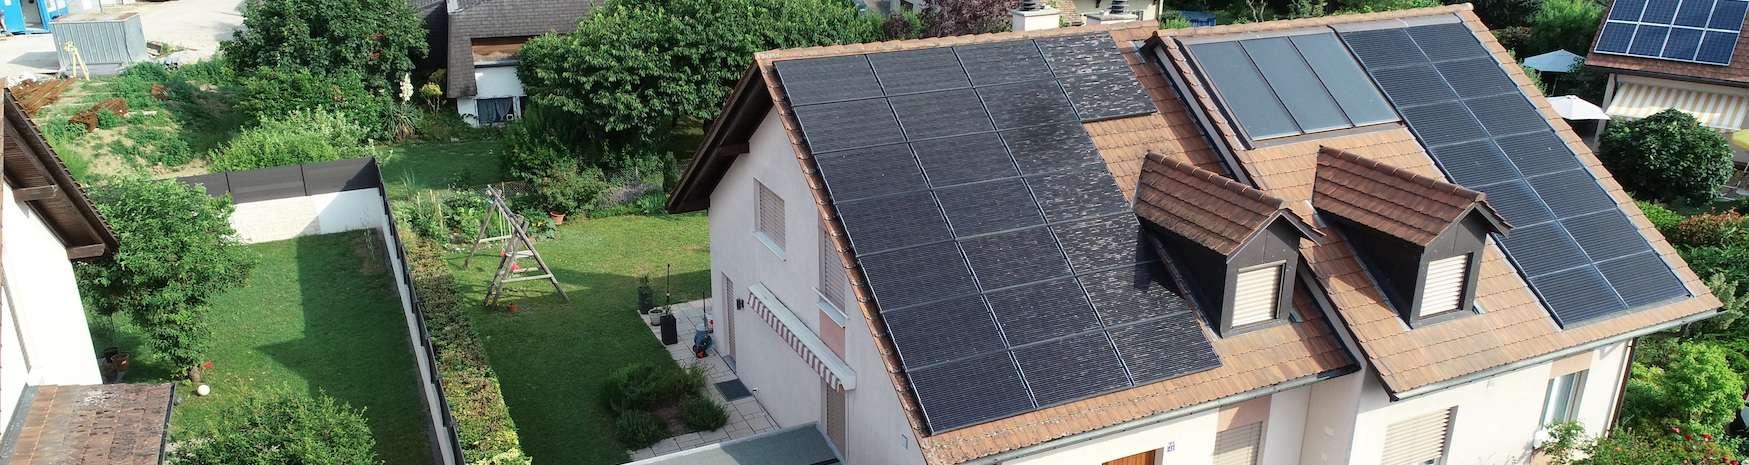 Installations panneaux solaires